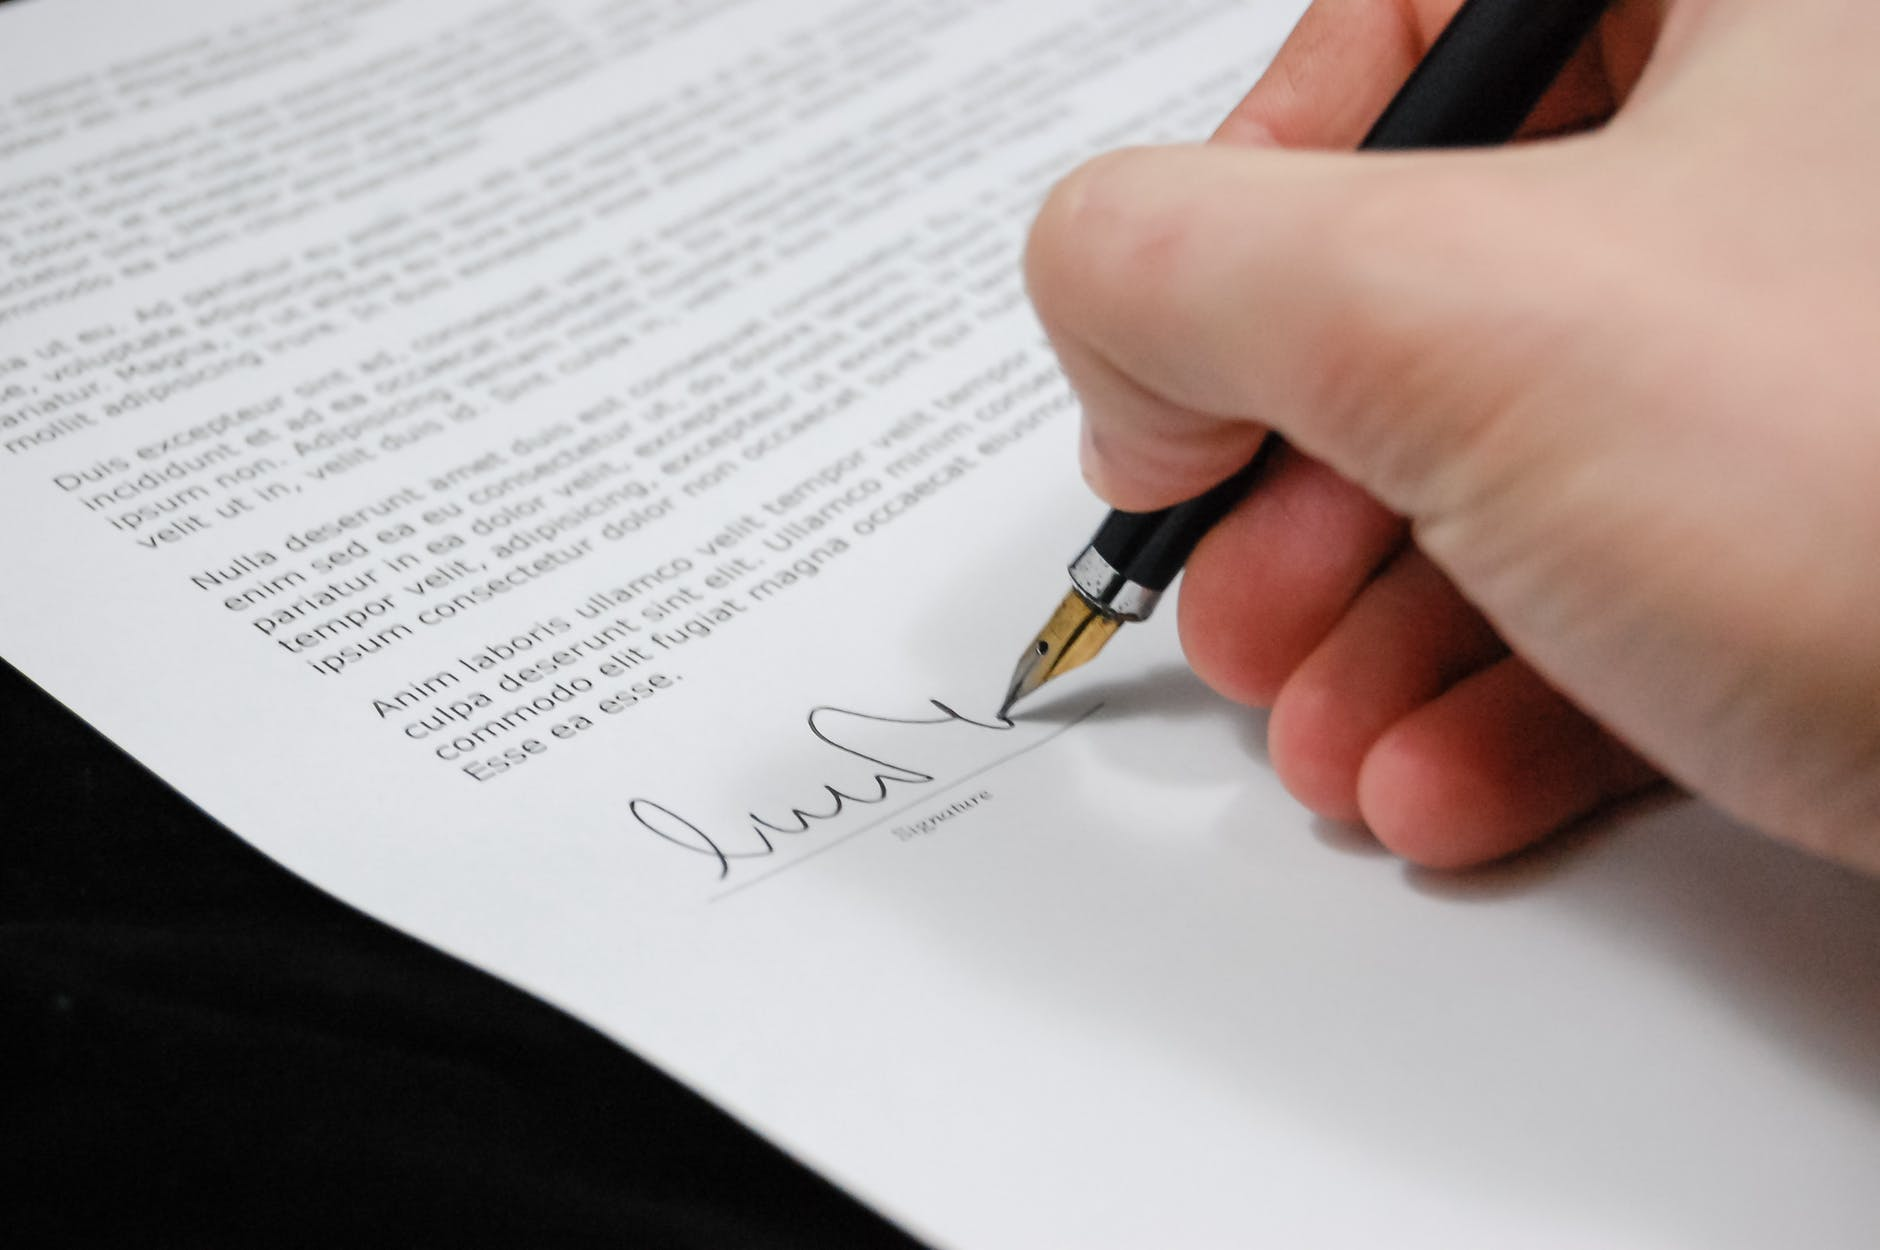 antes de firmar un contrato laboral